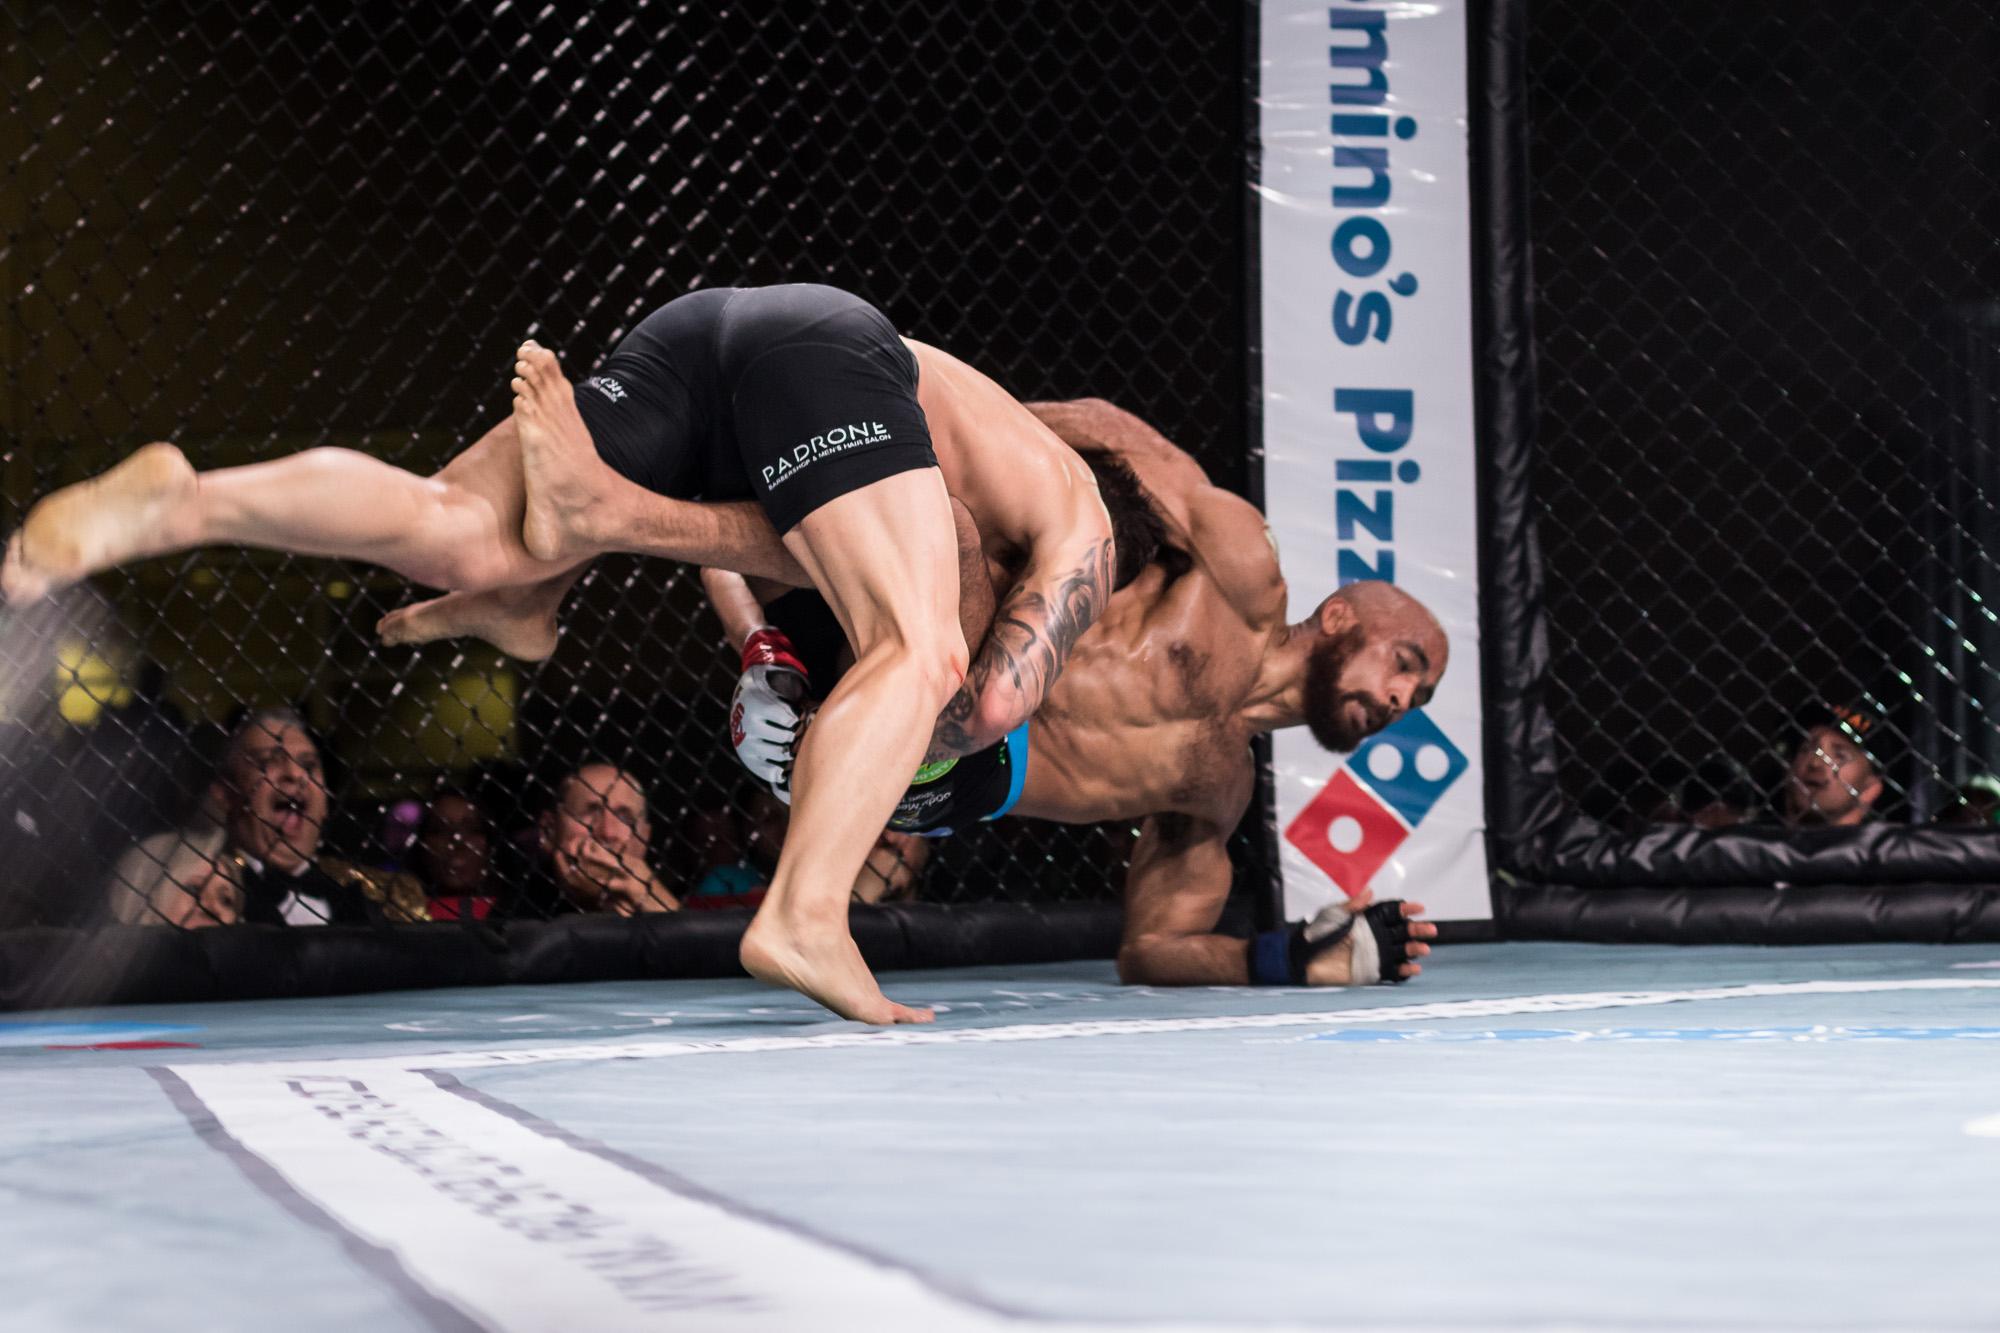 Fight #10 - TJ Laramie vs. Paris Stanford